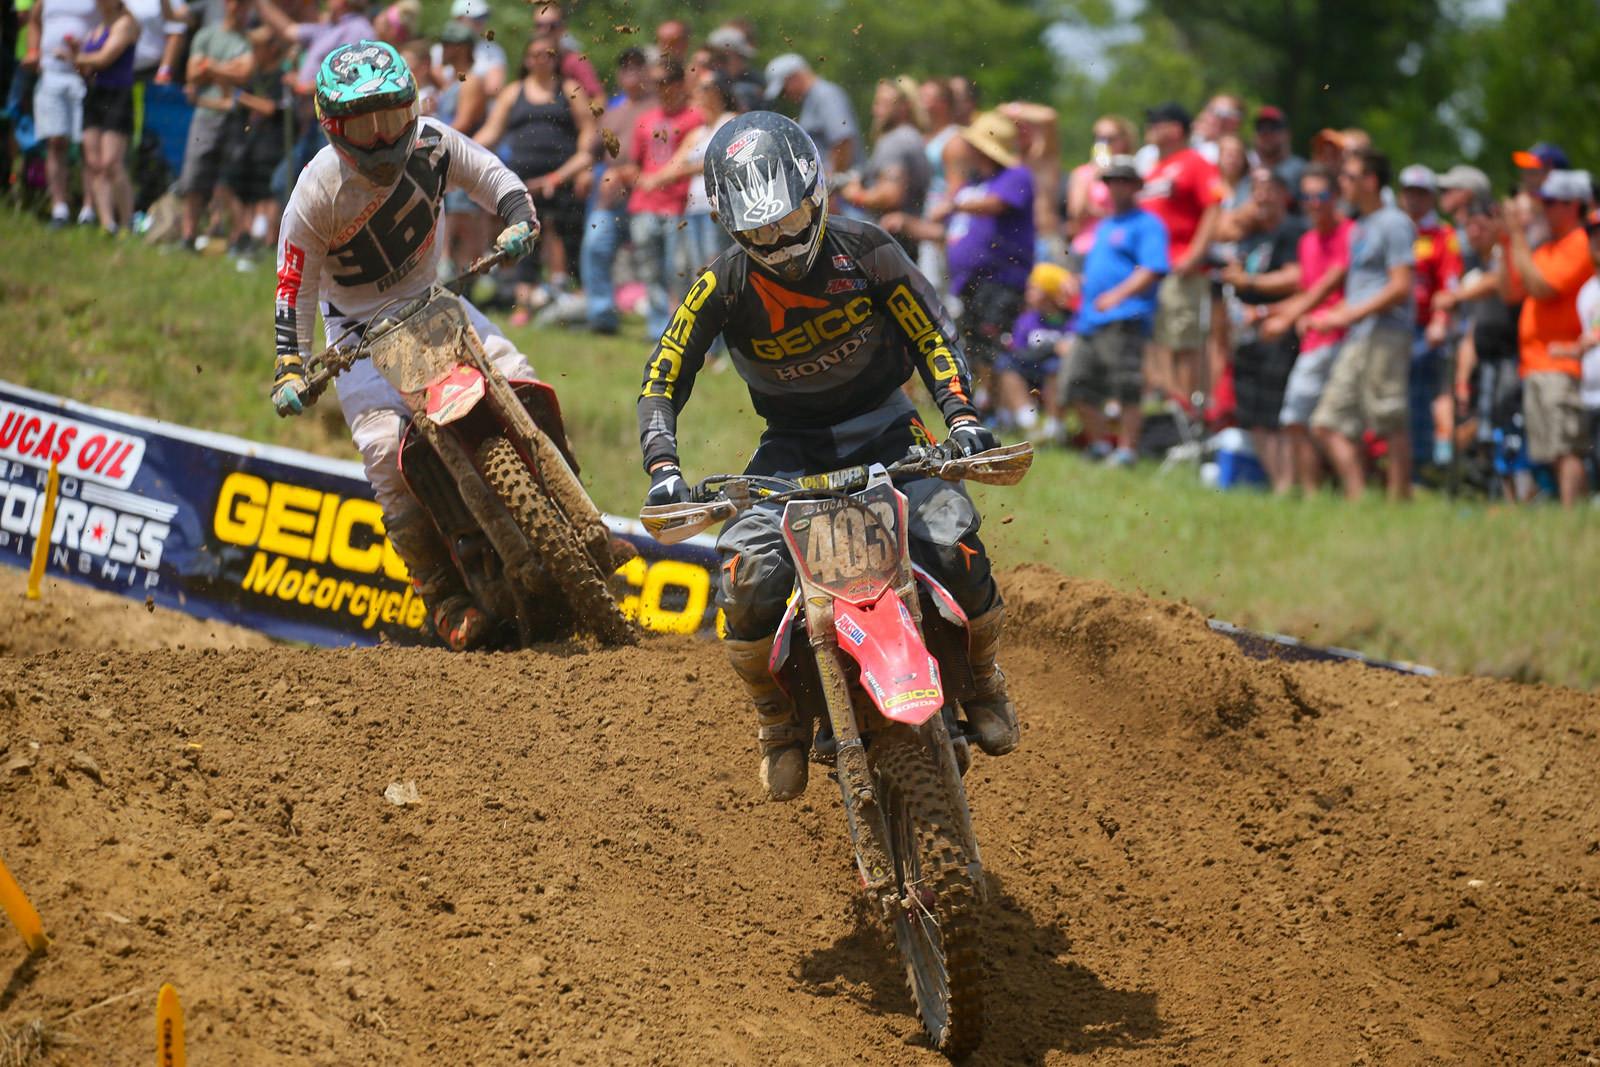 Tristan Charboneau - Vital MX Pit Bits: Spring Creek - Motocross Pictures - Vital MX